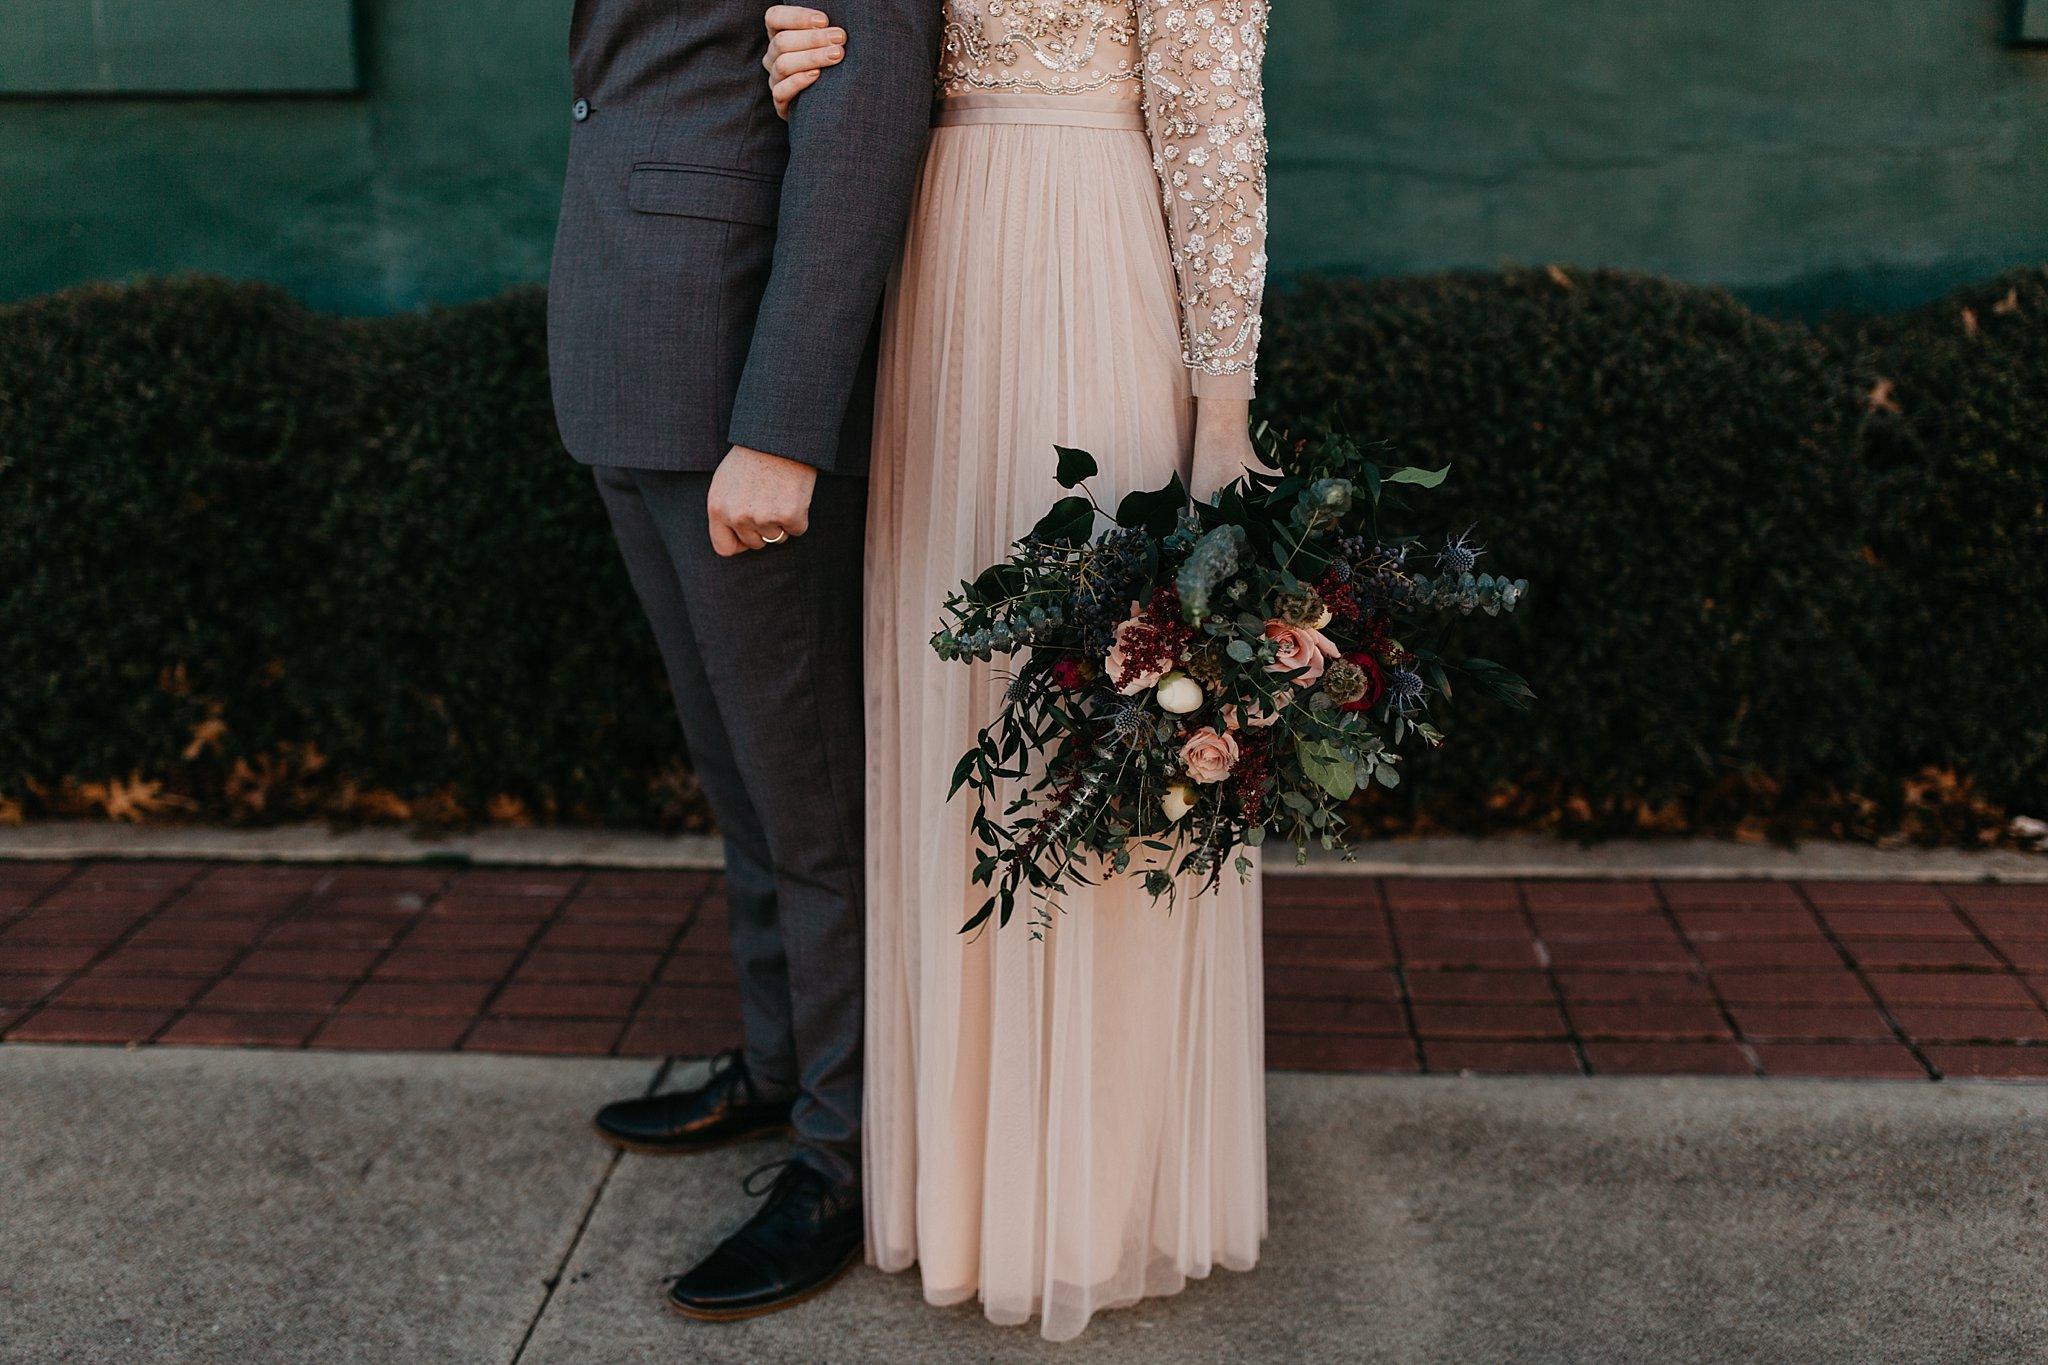 Wilderlove Co_Waco Texas_The Phoenix_Romantic Wedding Photography_0034.jpg